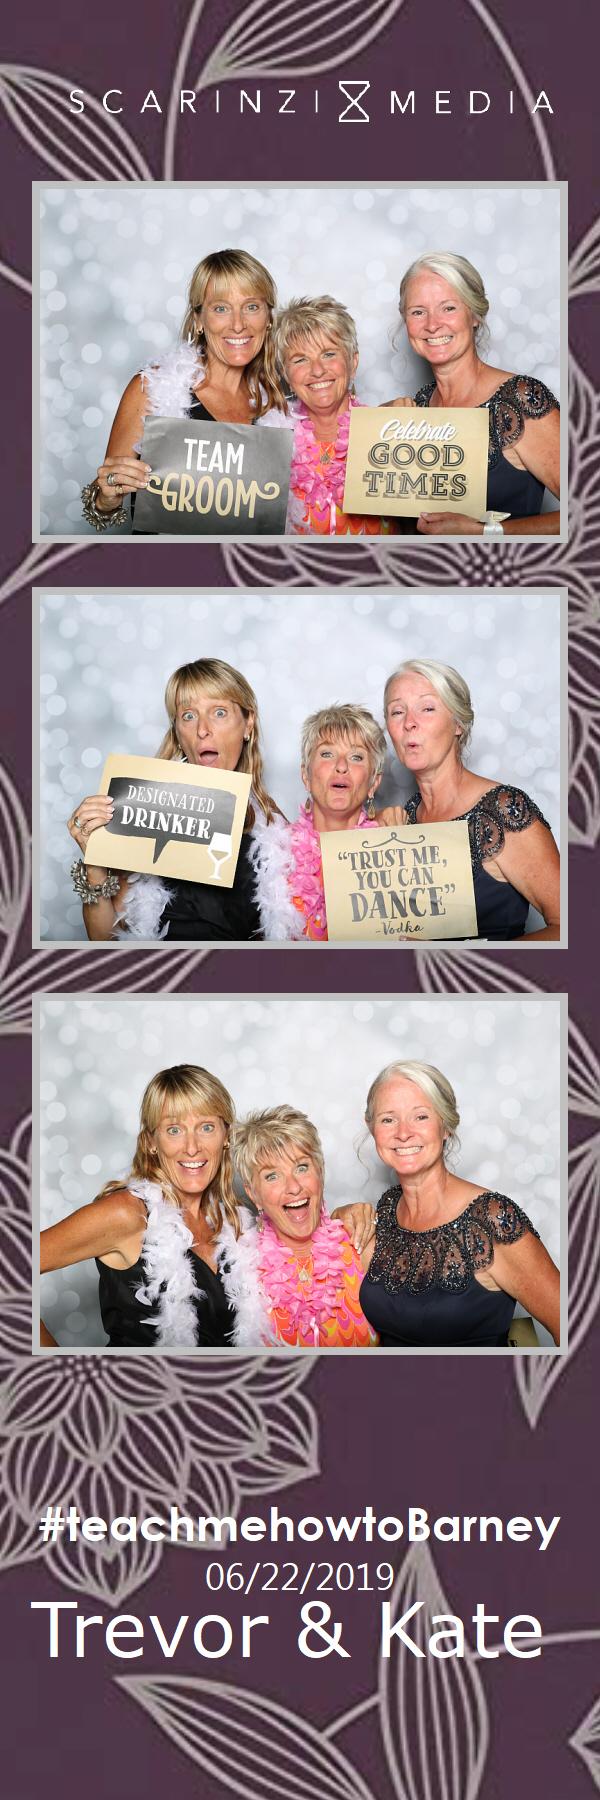 2019.06.22 - Barney Wedding PHOTOBOOTH11.jpg